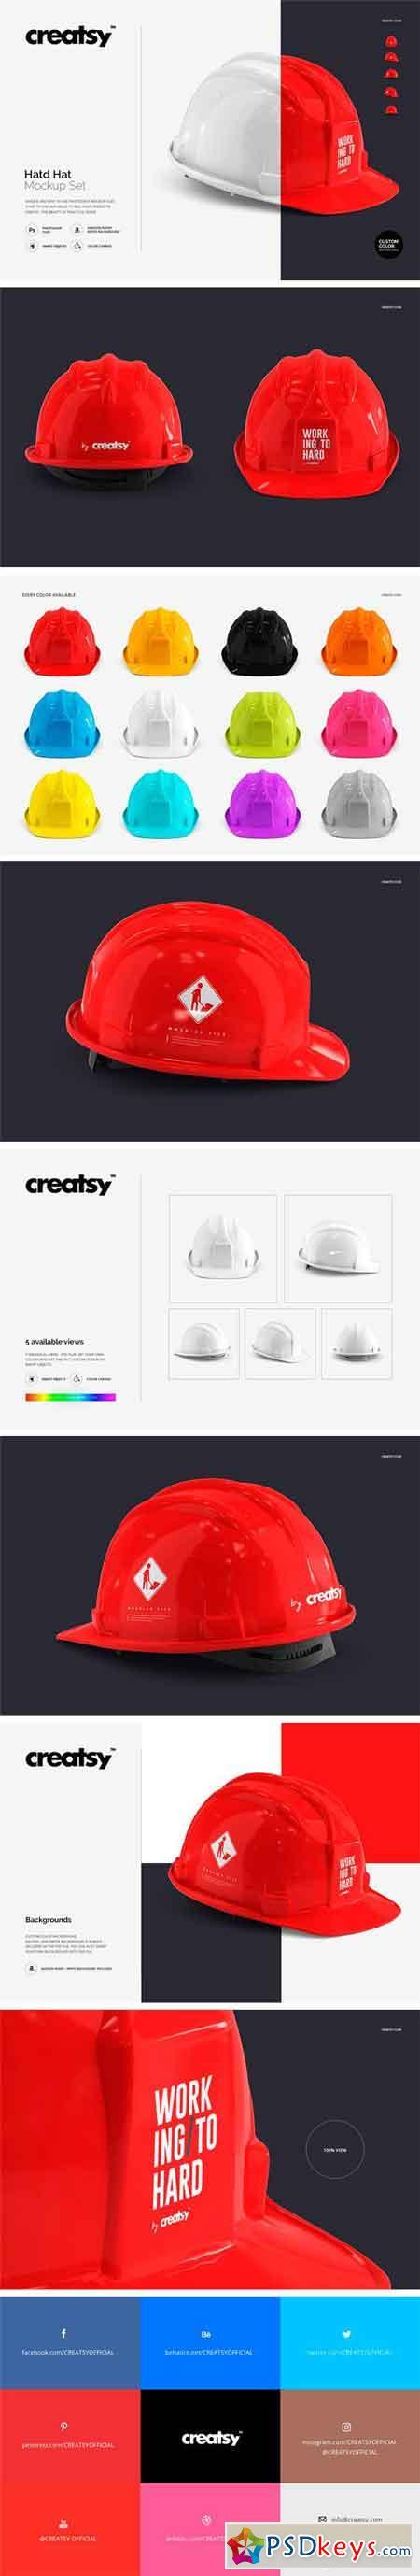 hat » Free Download Photoshop Vector Stock image Via Torrent